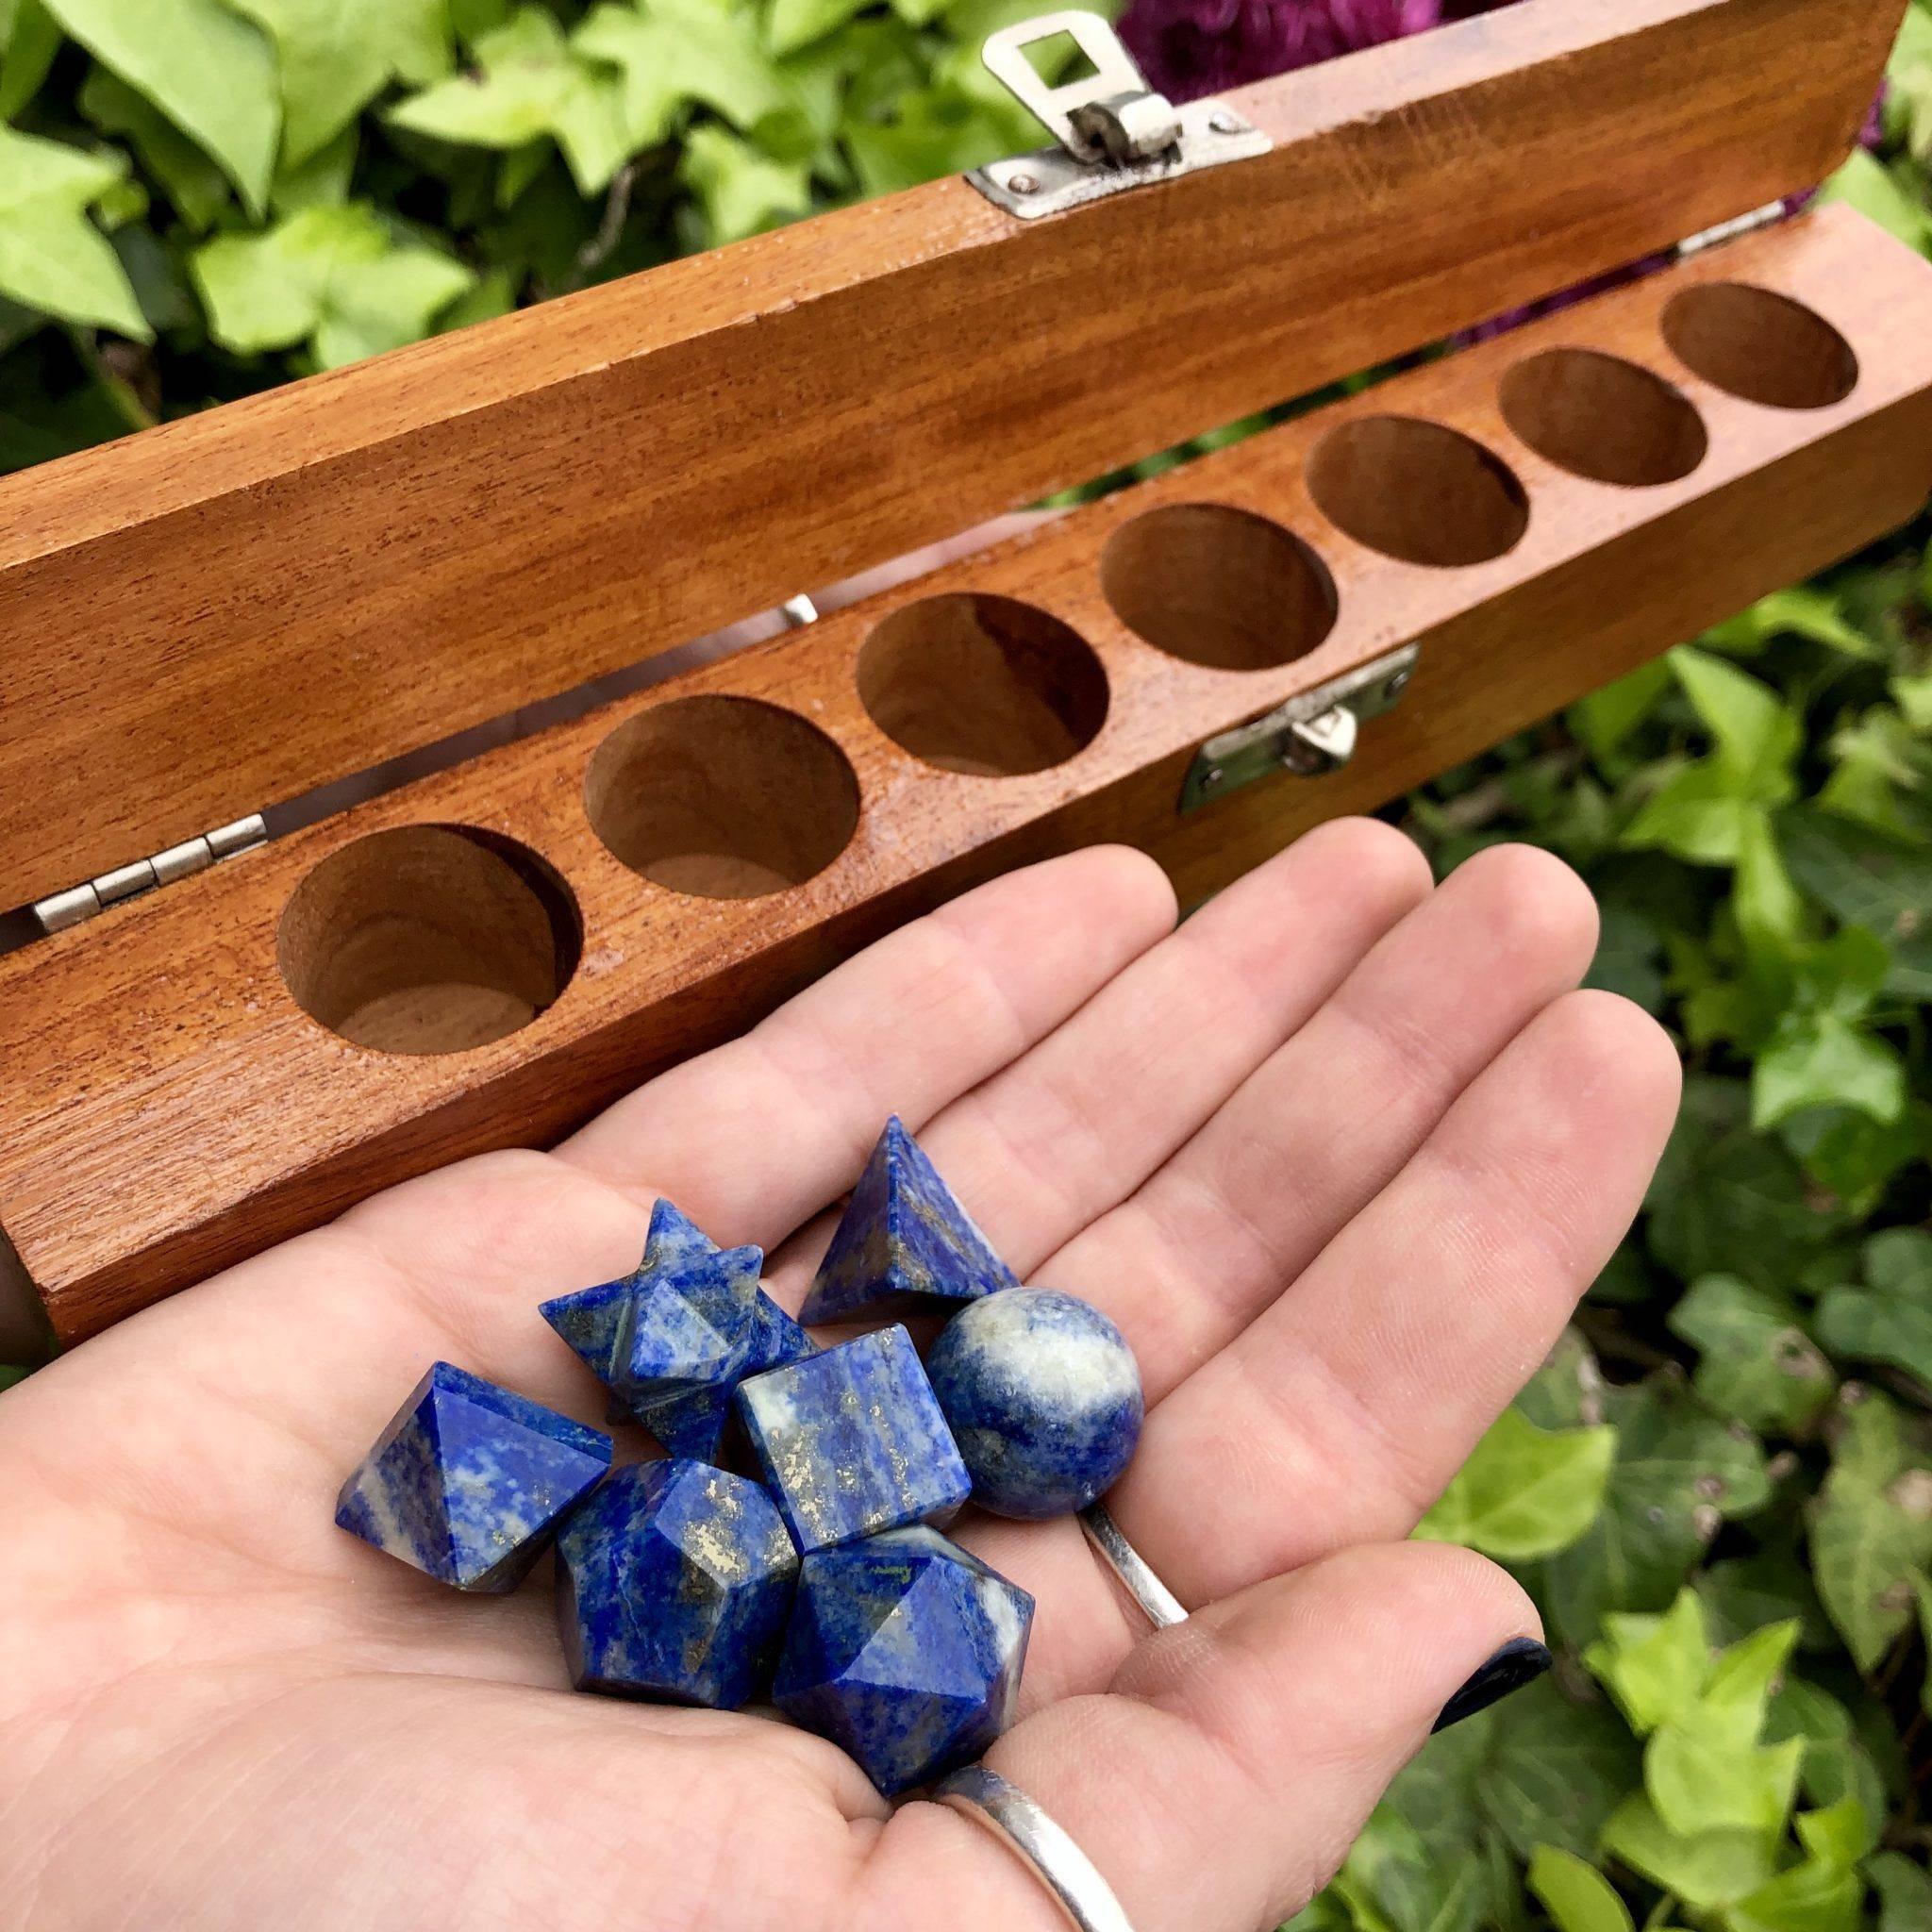 Specimen Lapis Lazuli Sacred Geometry Set In Wooden Box